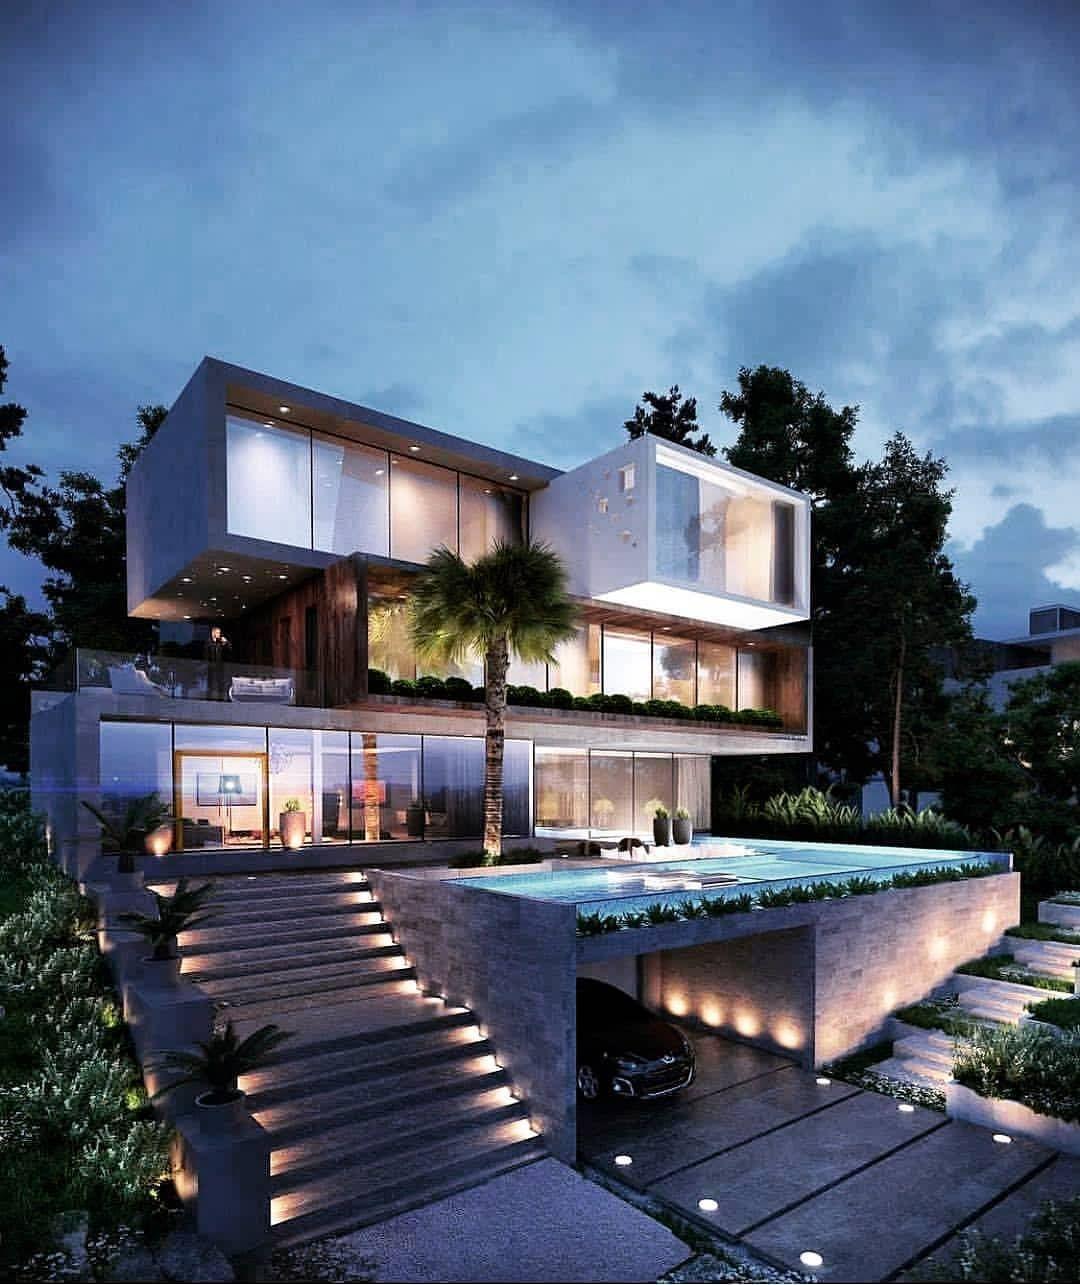 Hᴏᴜsᴇ Iɴsᴘɪʀᴀᴛɪᴏɴ On Instagram House Goals Rate It Follow My House Inspiration For Mo Luxury House Designs Luxury House Plans Modern House Design